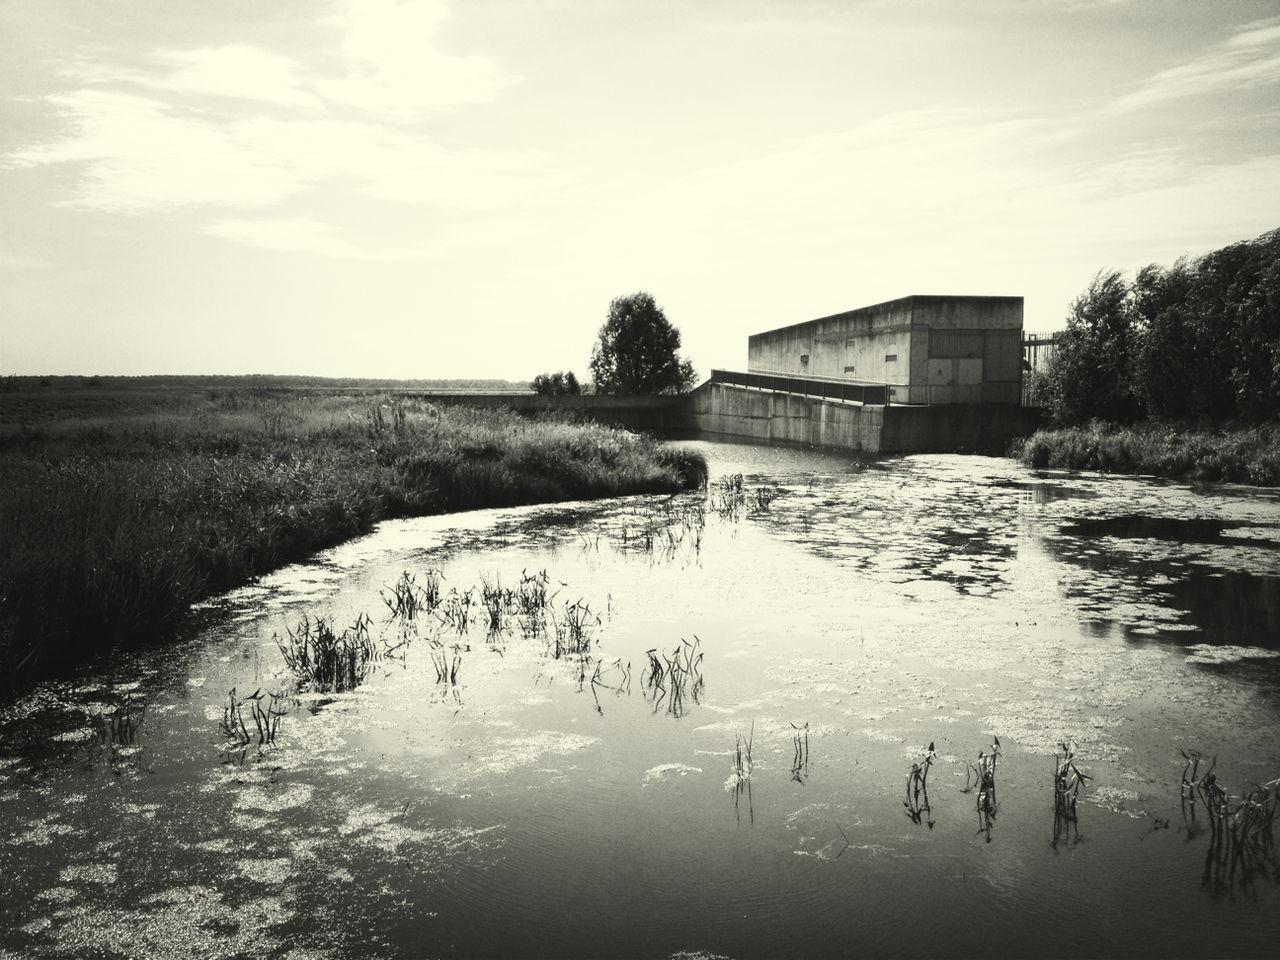 Pond by field against sky